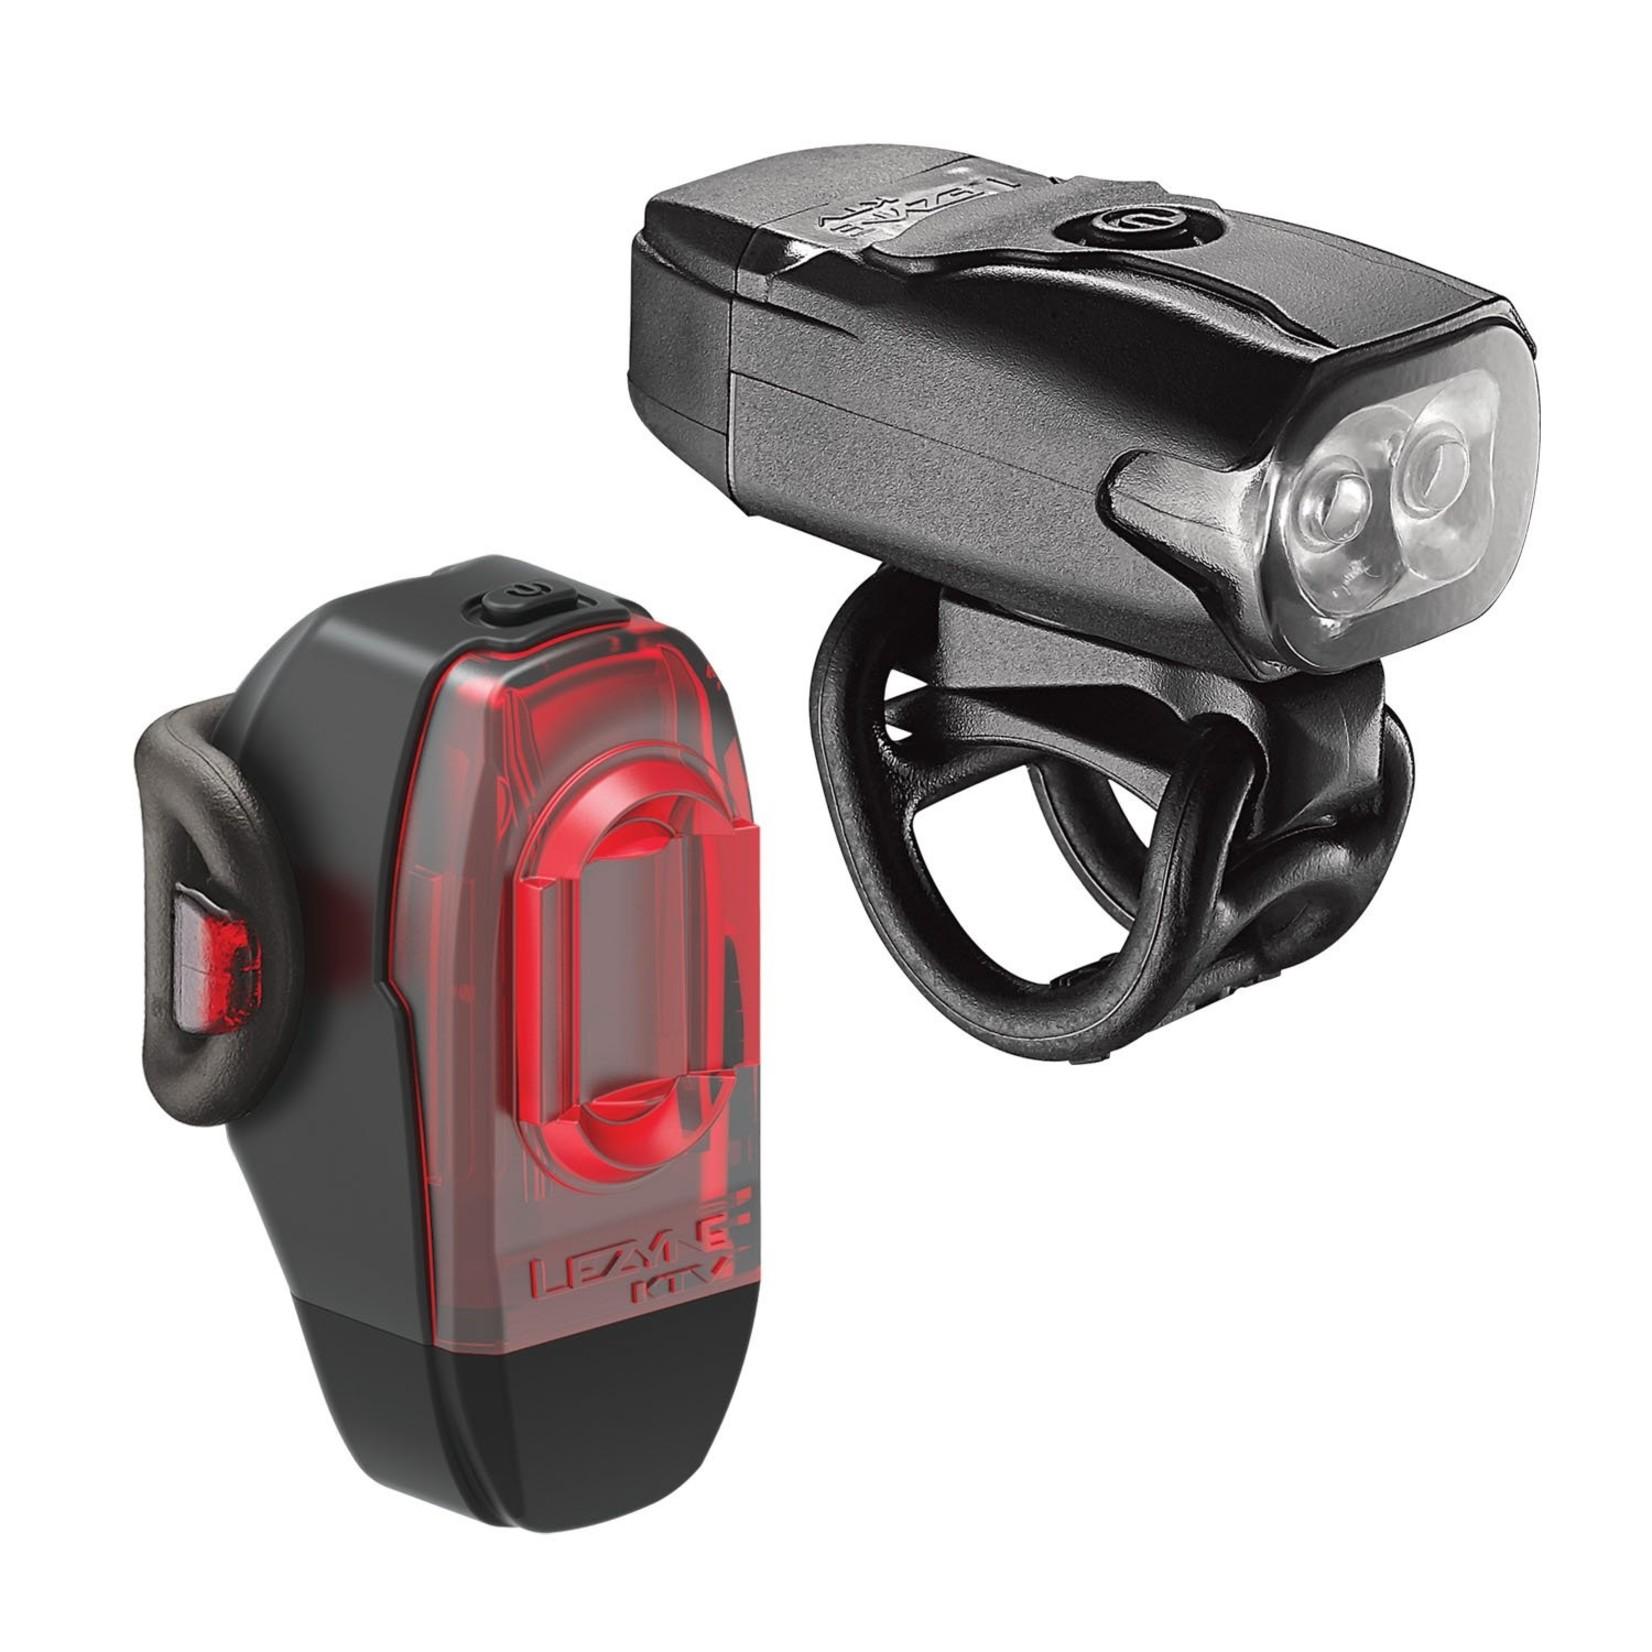 Lezyne Lezyne KTV Drive Headlight and Taillight Set: Black